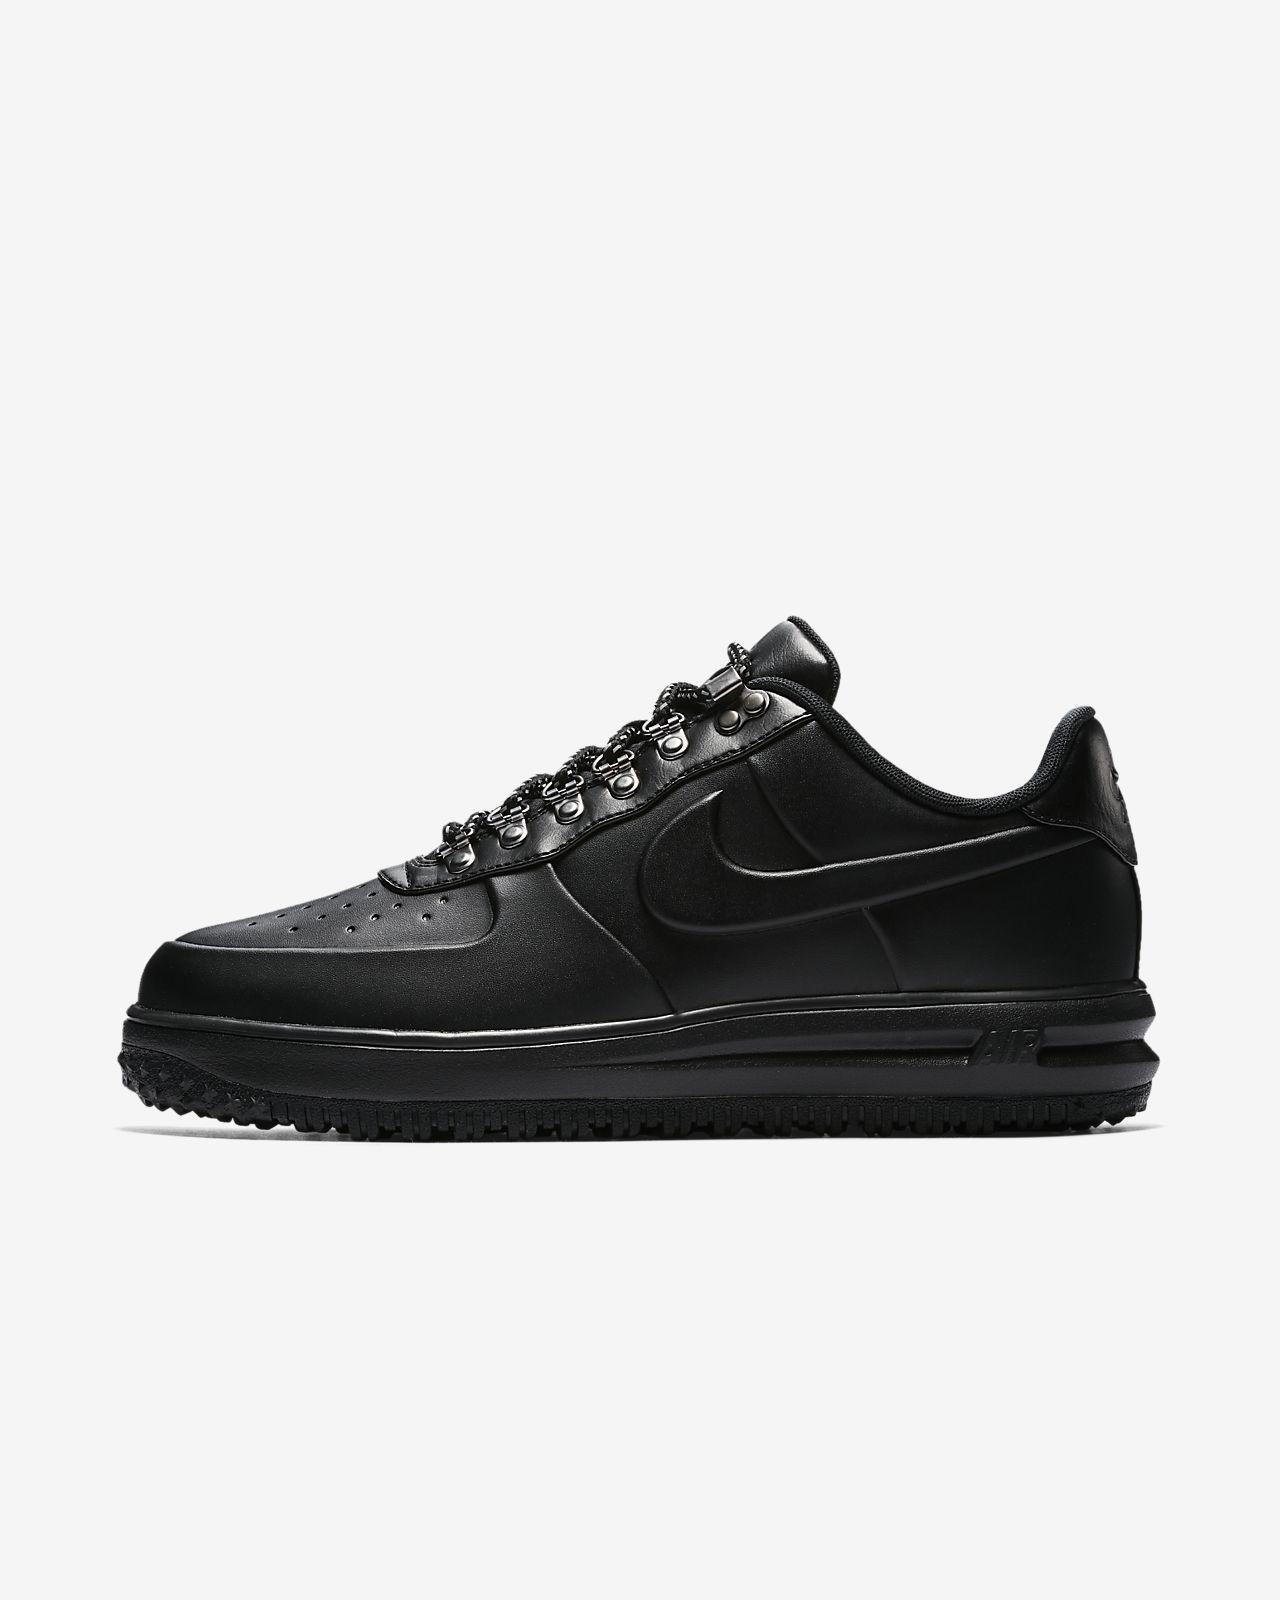 new product 6b66b 07f32 Nike Lunar Force 1 Duckboot Low Men s Shoe